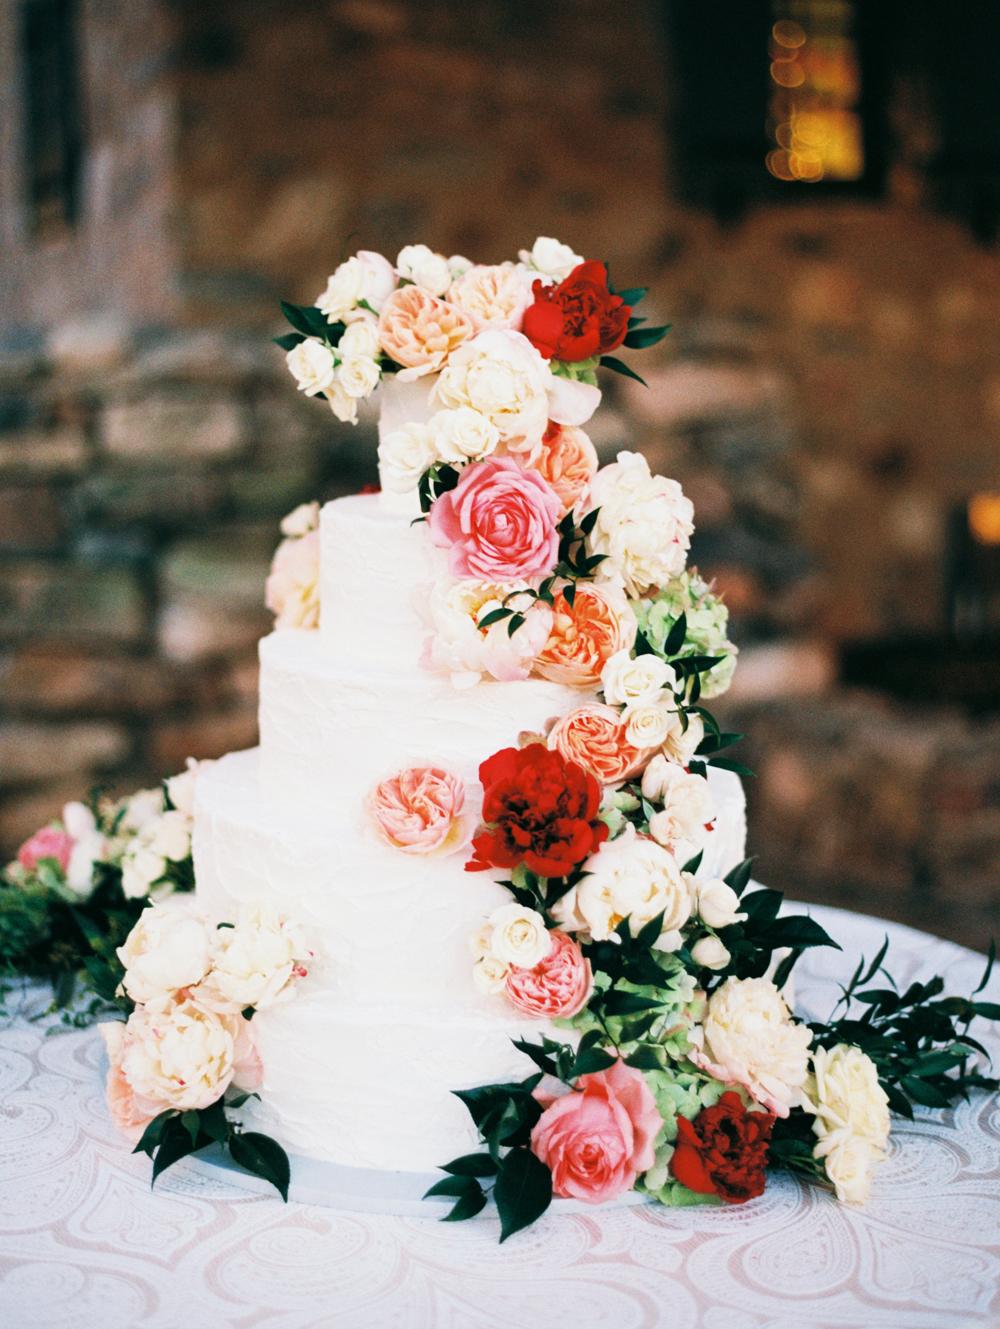 floral wedding cakes eric mcvey stone greenery